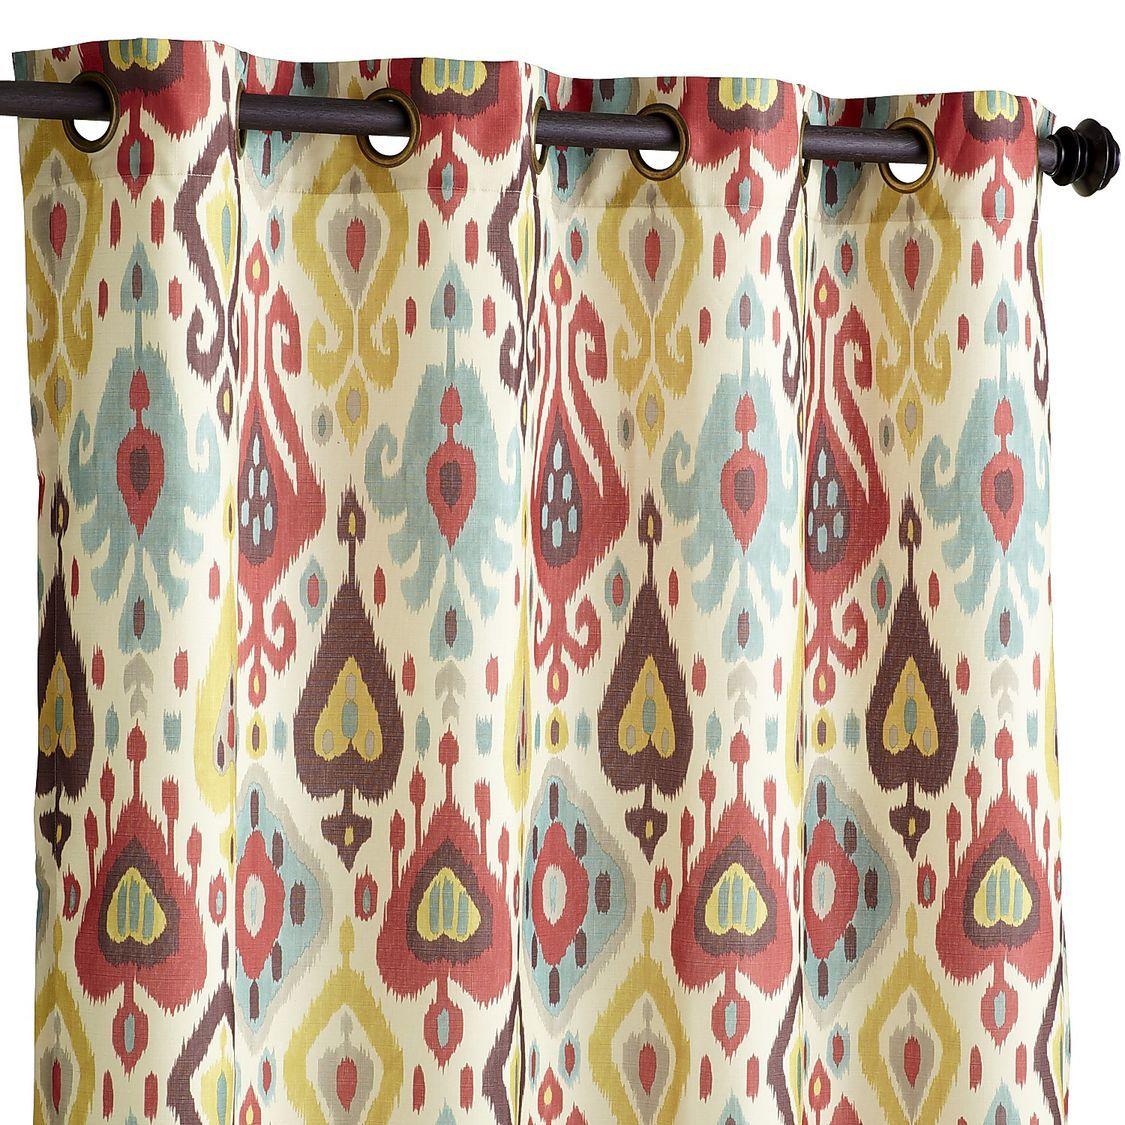 Ikat Curtain Vibrant Ikat Curtains Printed Curtains Curtains